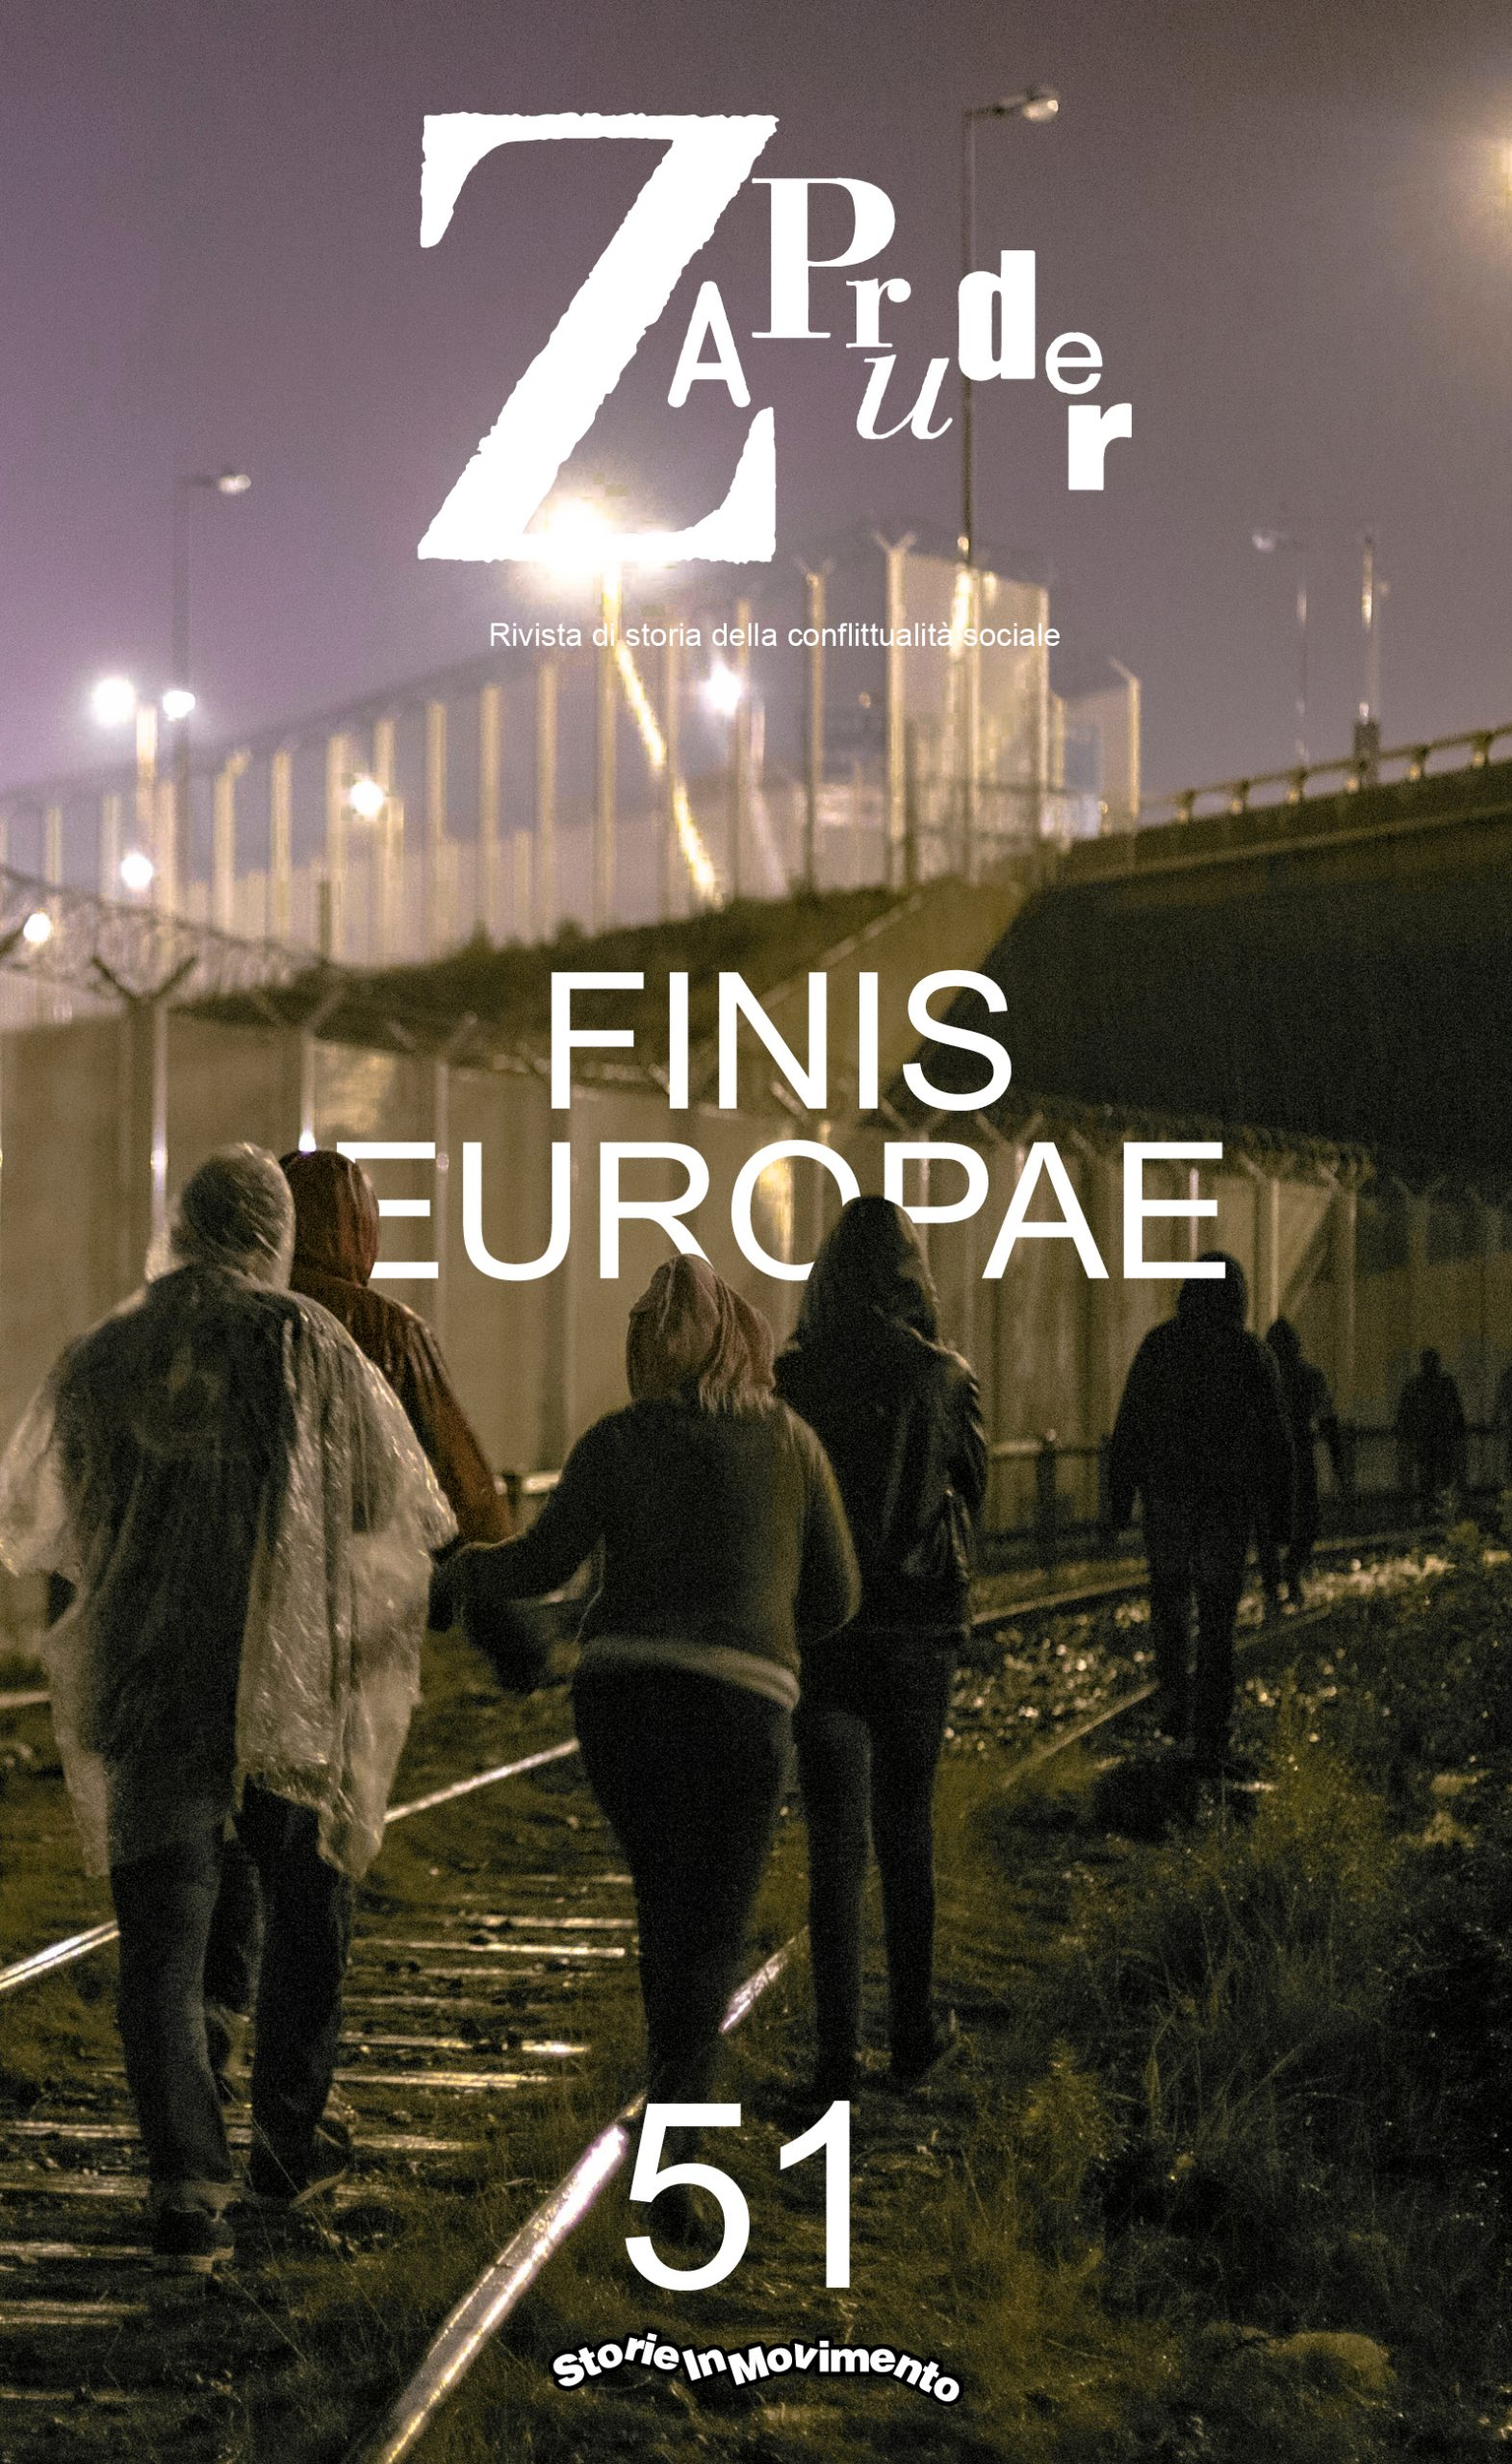 finis europae zapruder 51